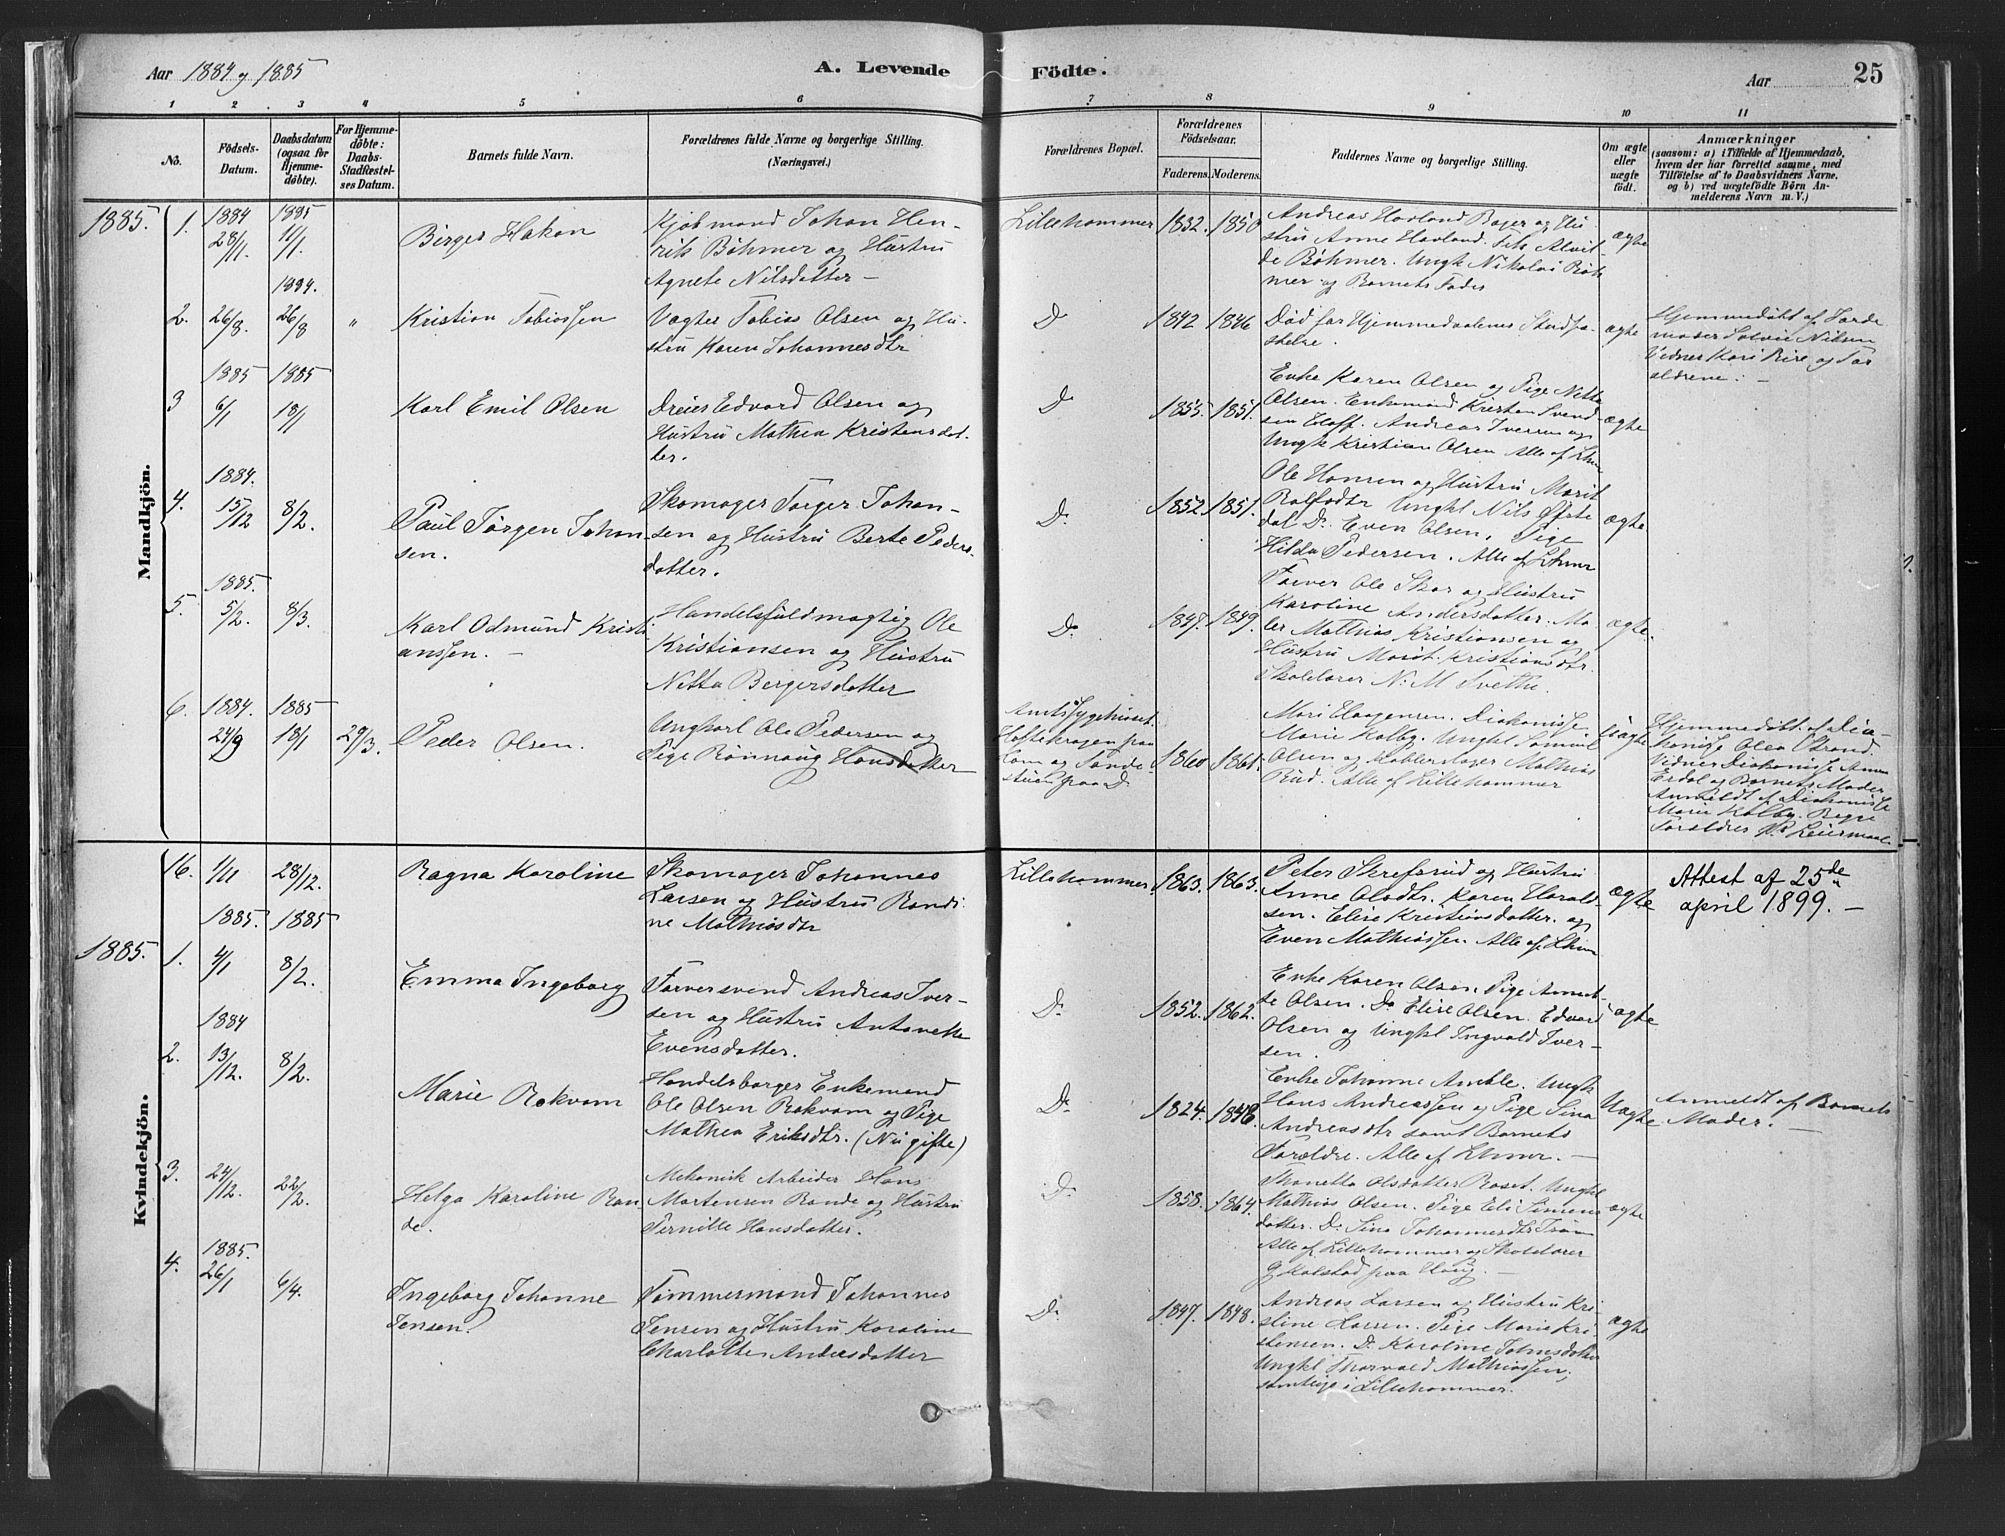 SAH, Fåberg prestekontor, H/Ha/Haa/L0010: Parish register (official) no. 10, 1879-1900, p. 25